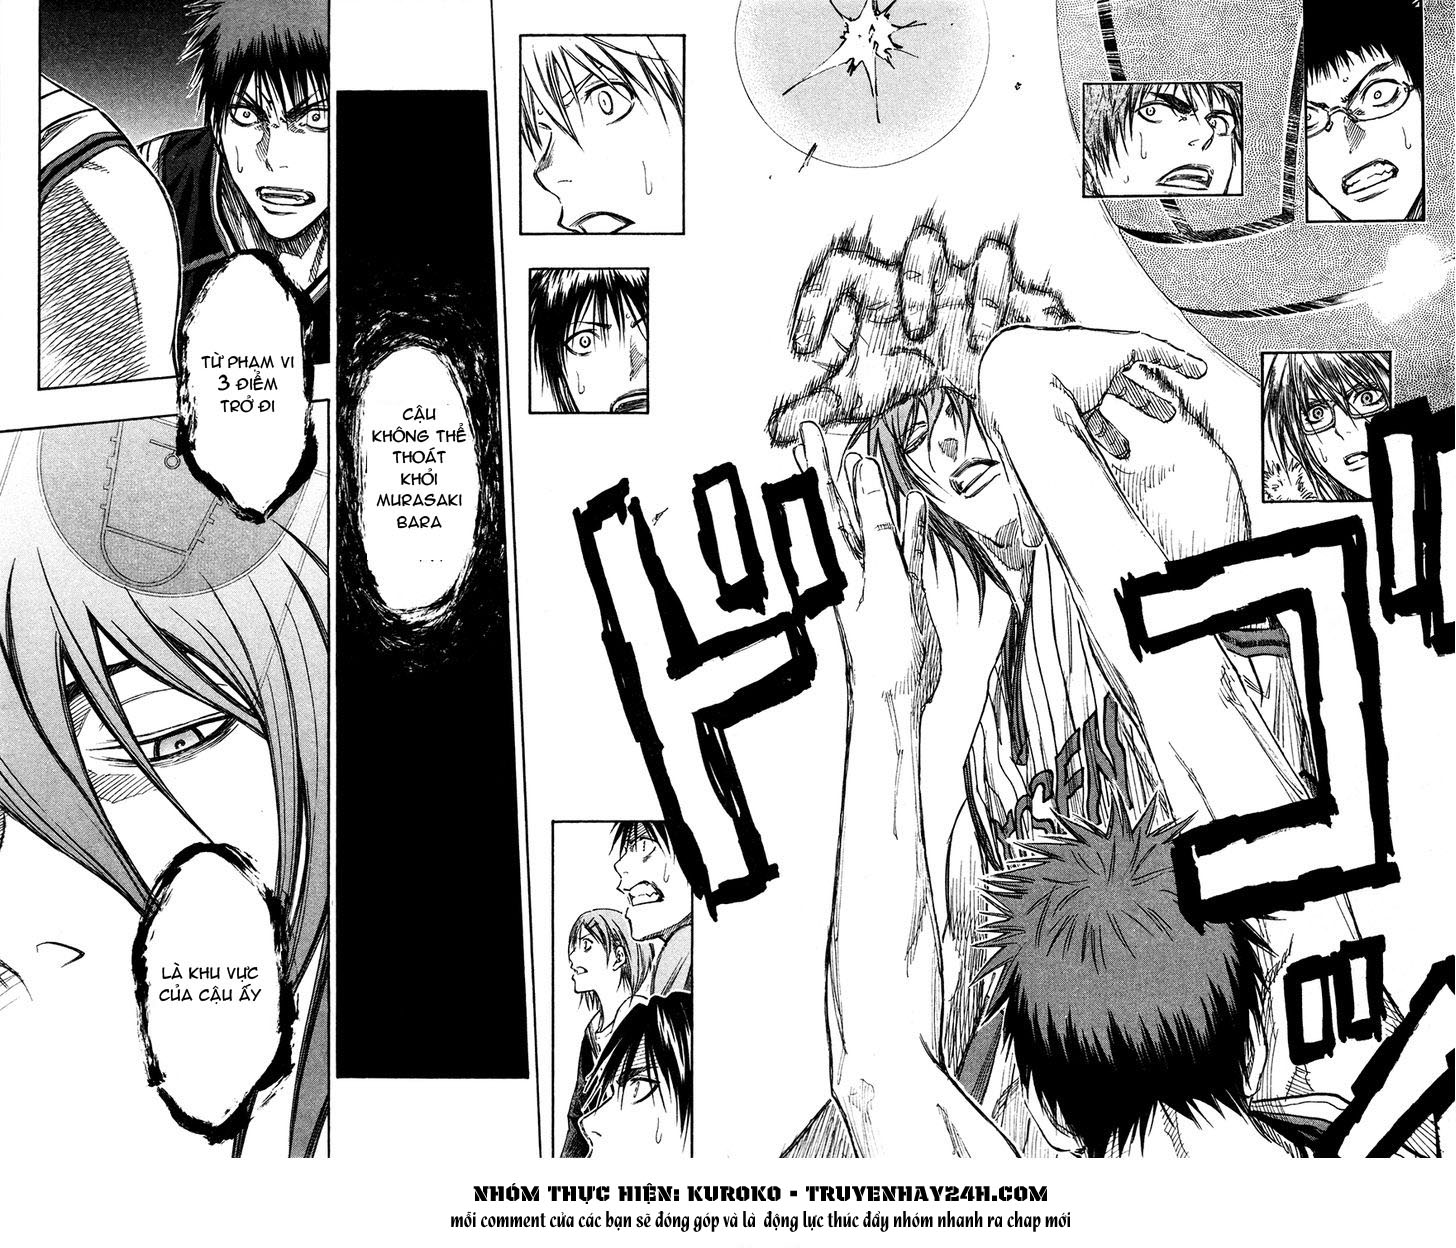 Kuroko No Basket chap 146 trang 16